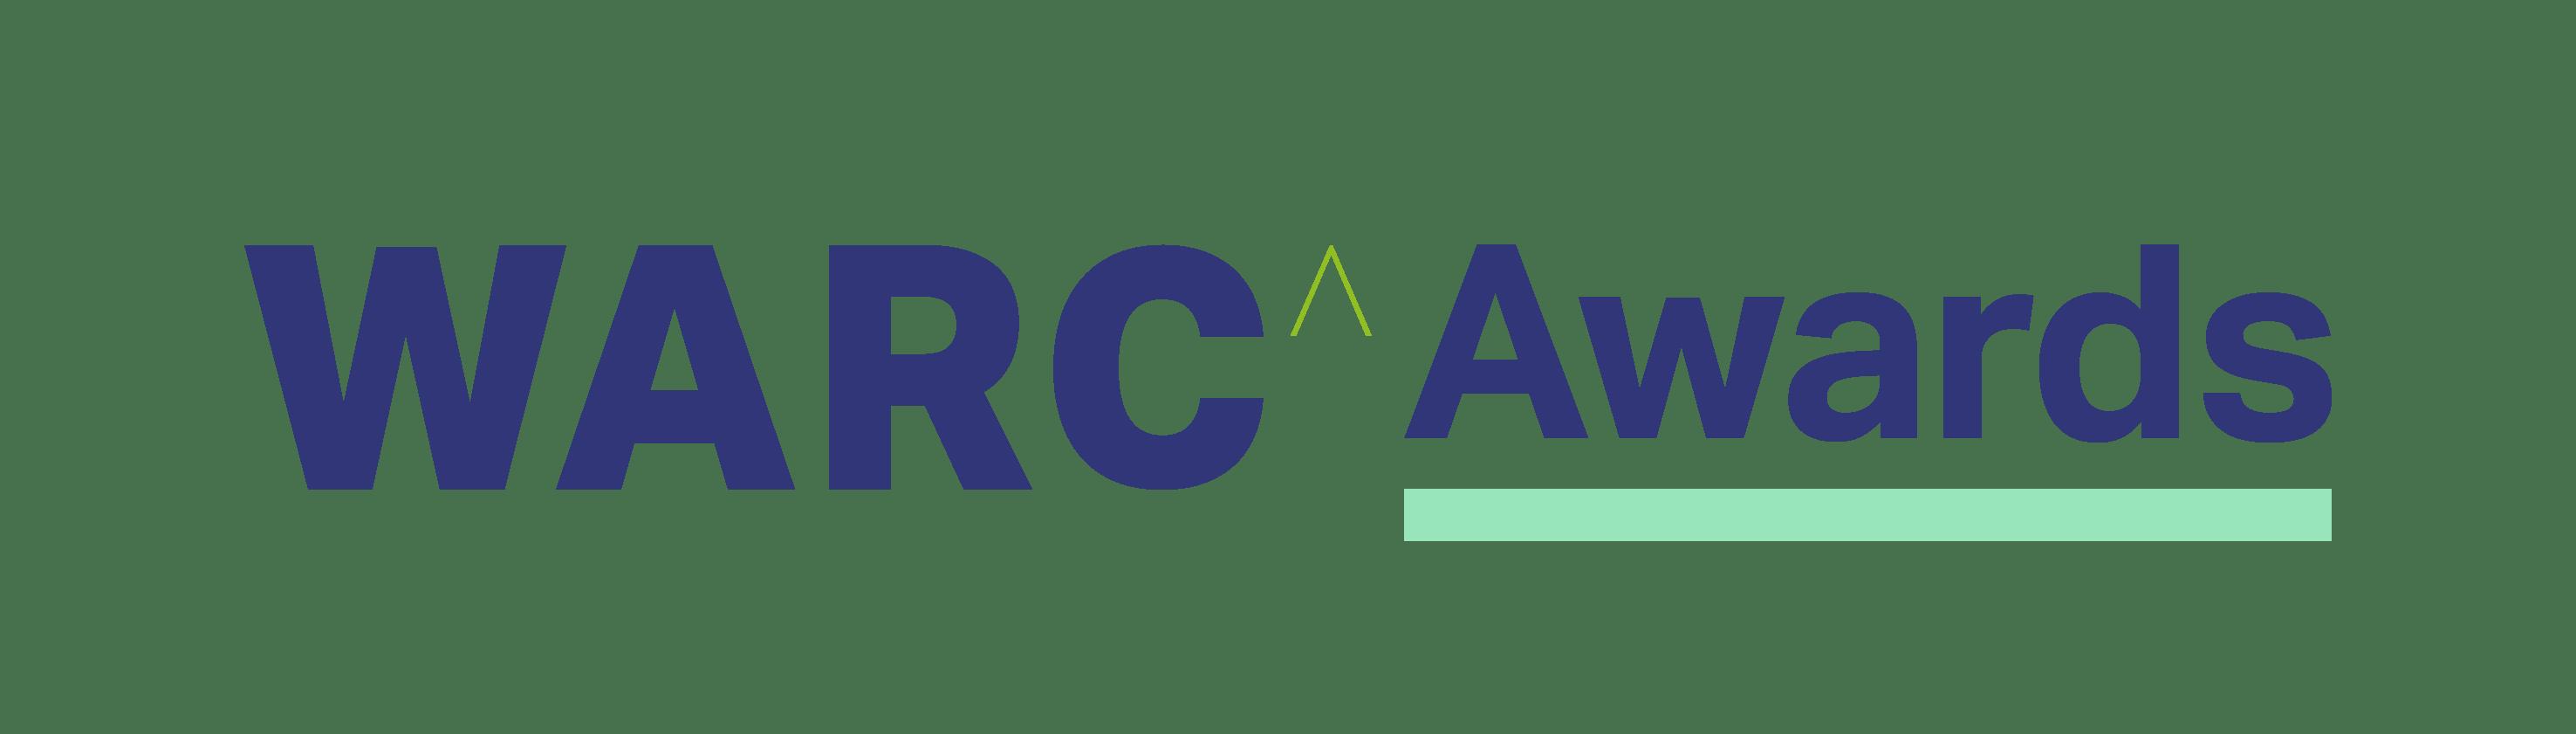 Global WARC Award